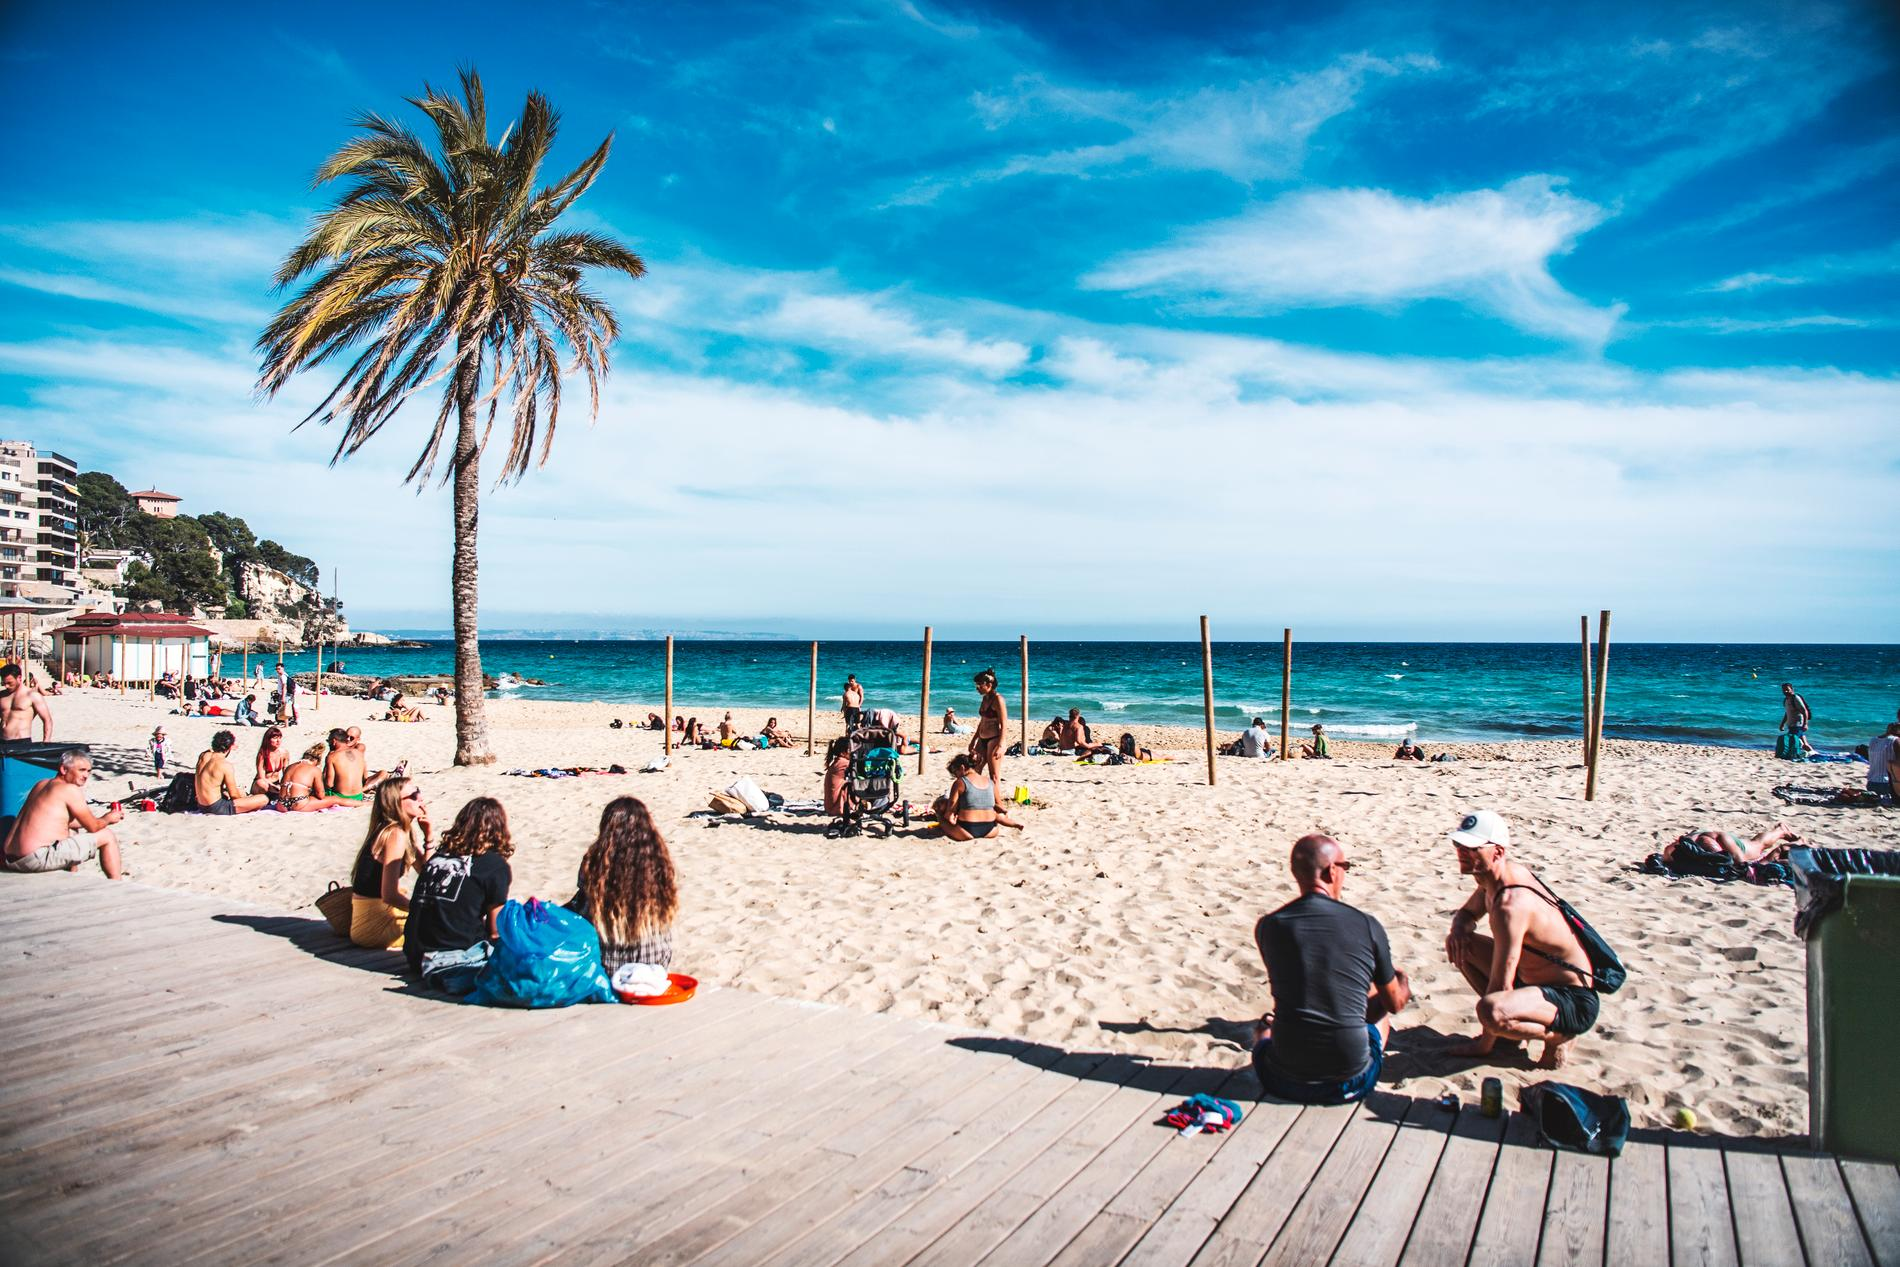 Resa på semester under coronapandemin. Stranden i Cala Major, Palma, Mallorca, Spanien.